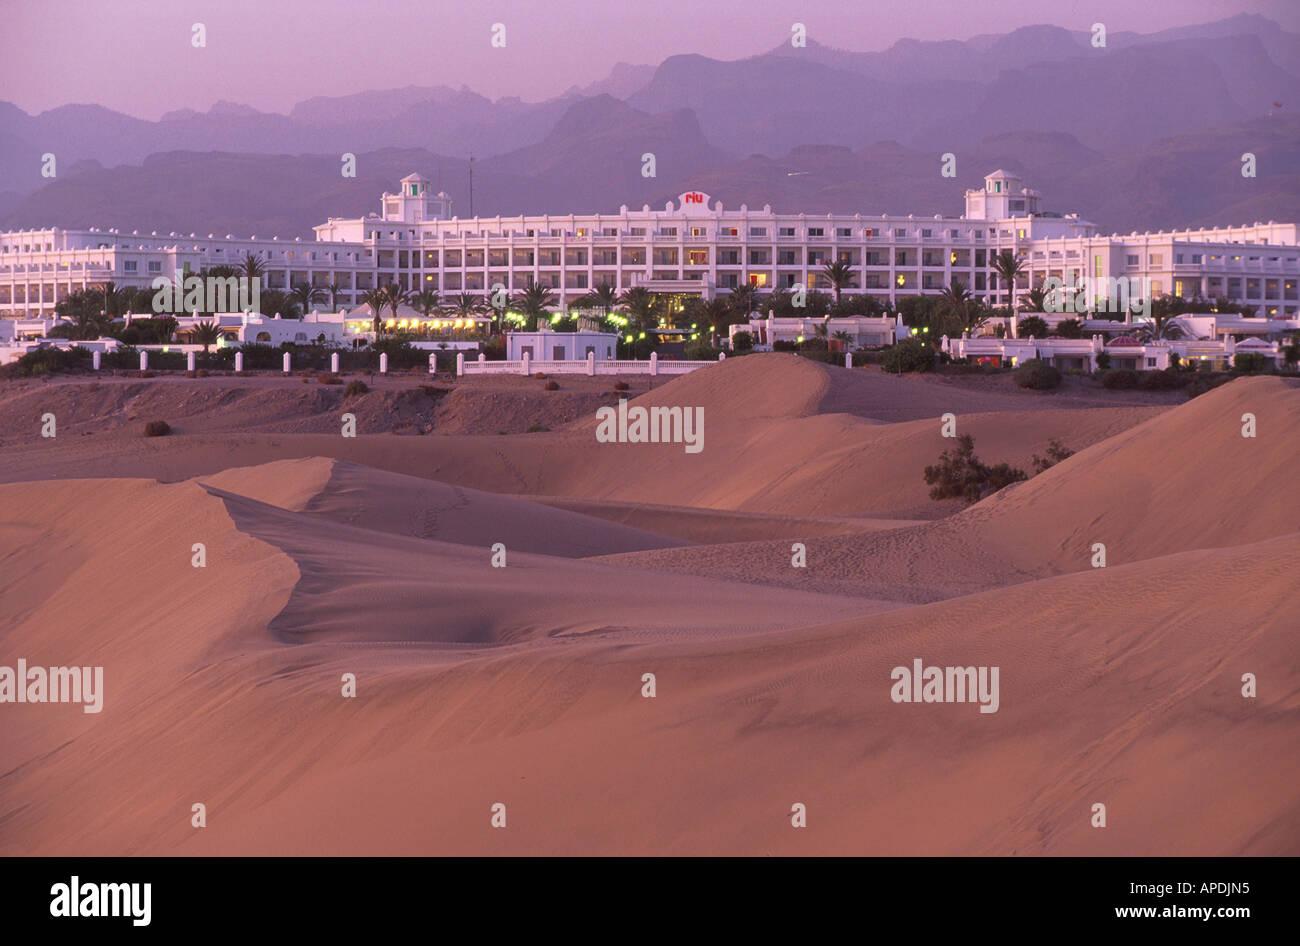 Hotel Riu Palace, Duenen, Maspalomas, Gran Canaria Kanarische Inseln, Spanien - Stock Image